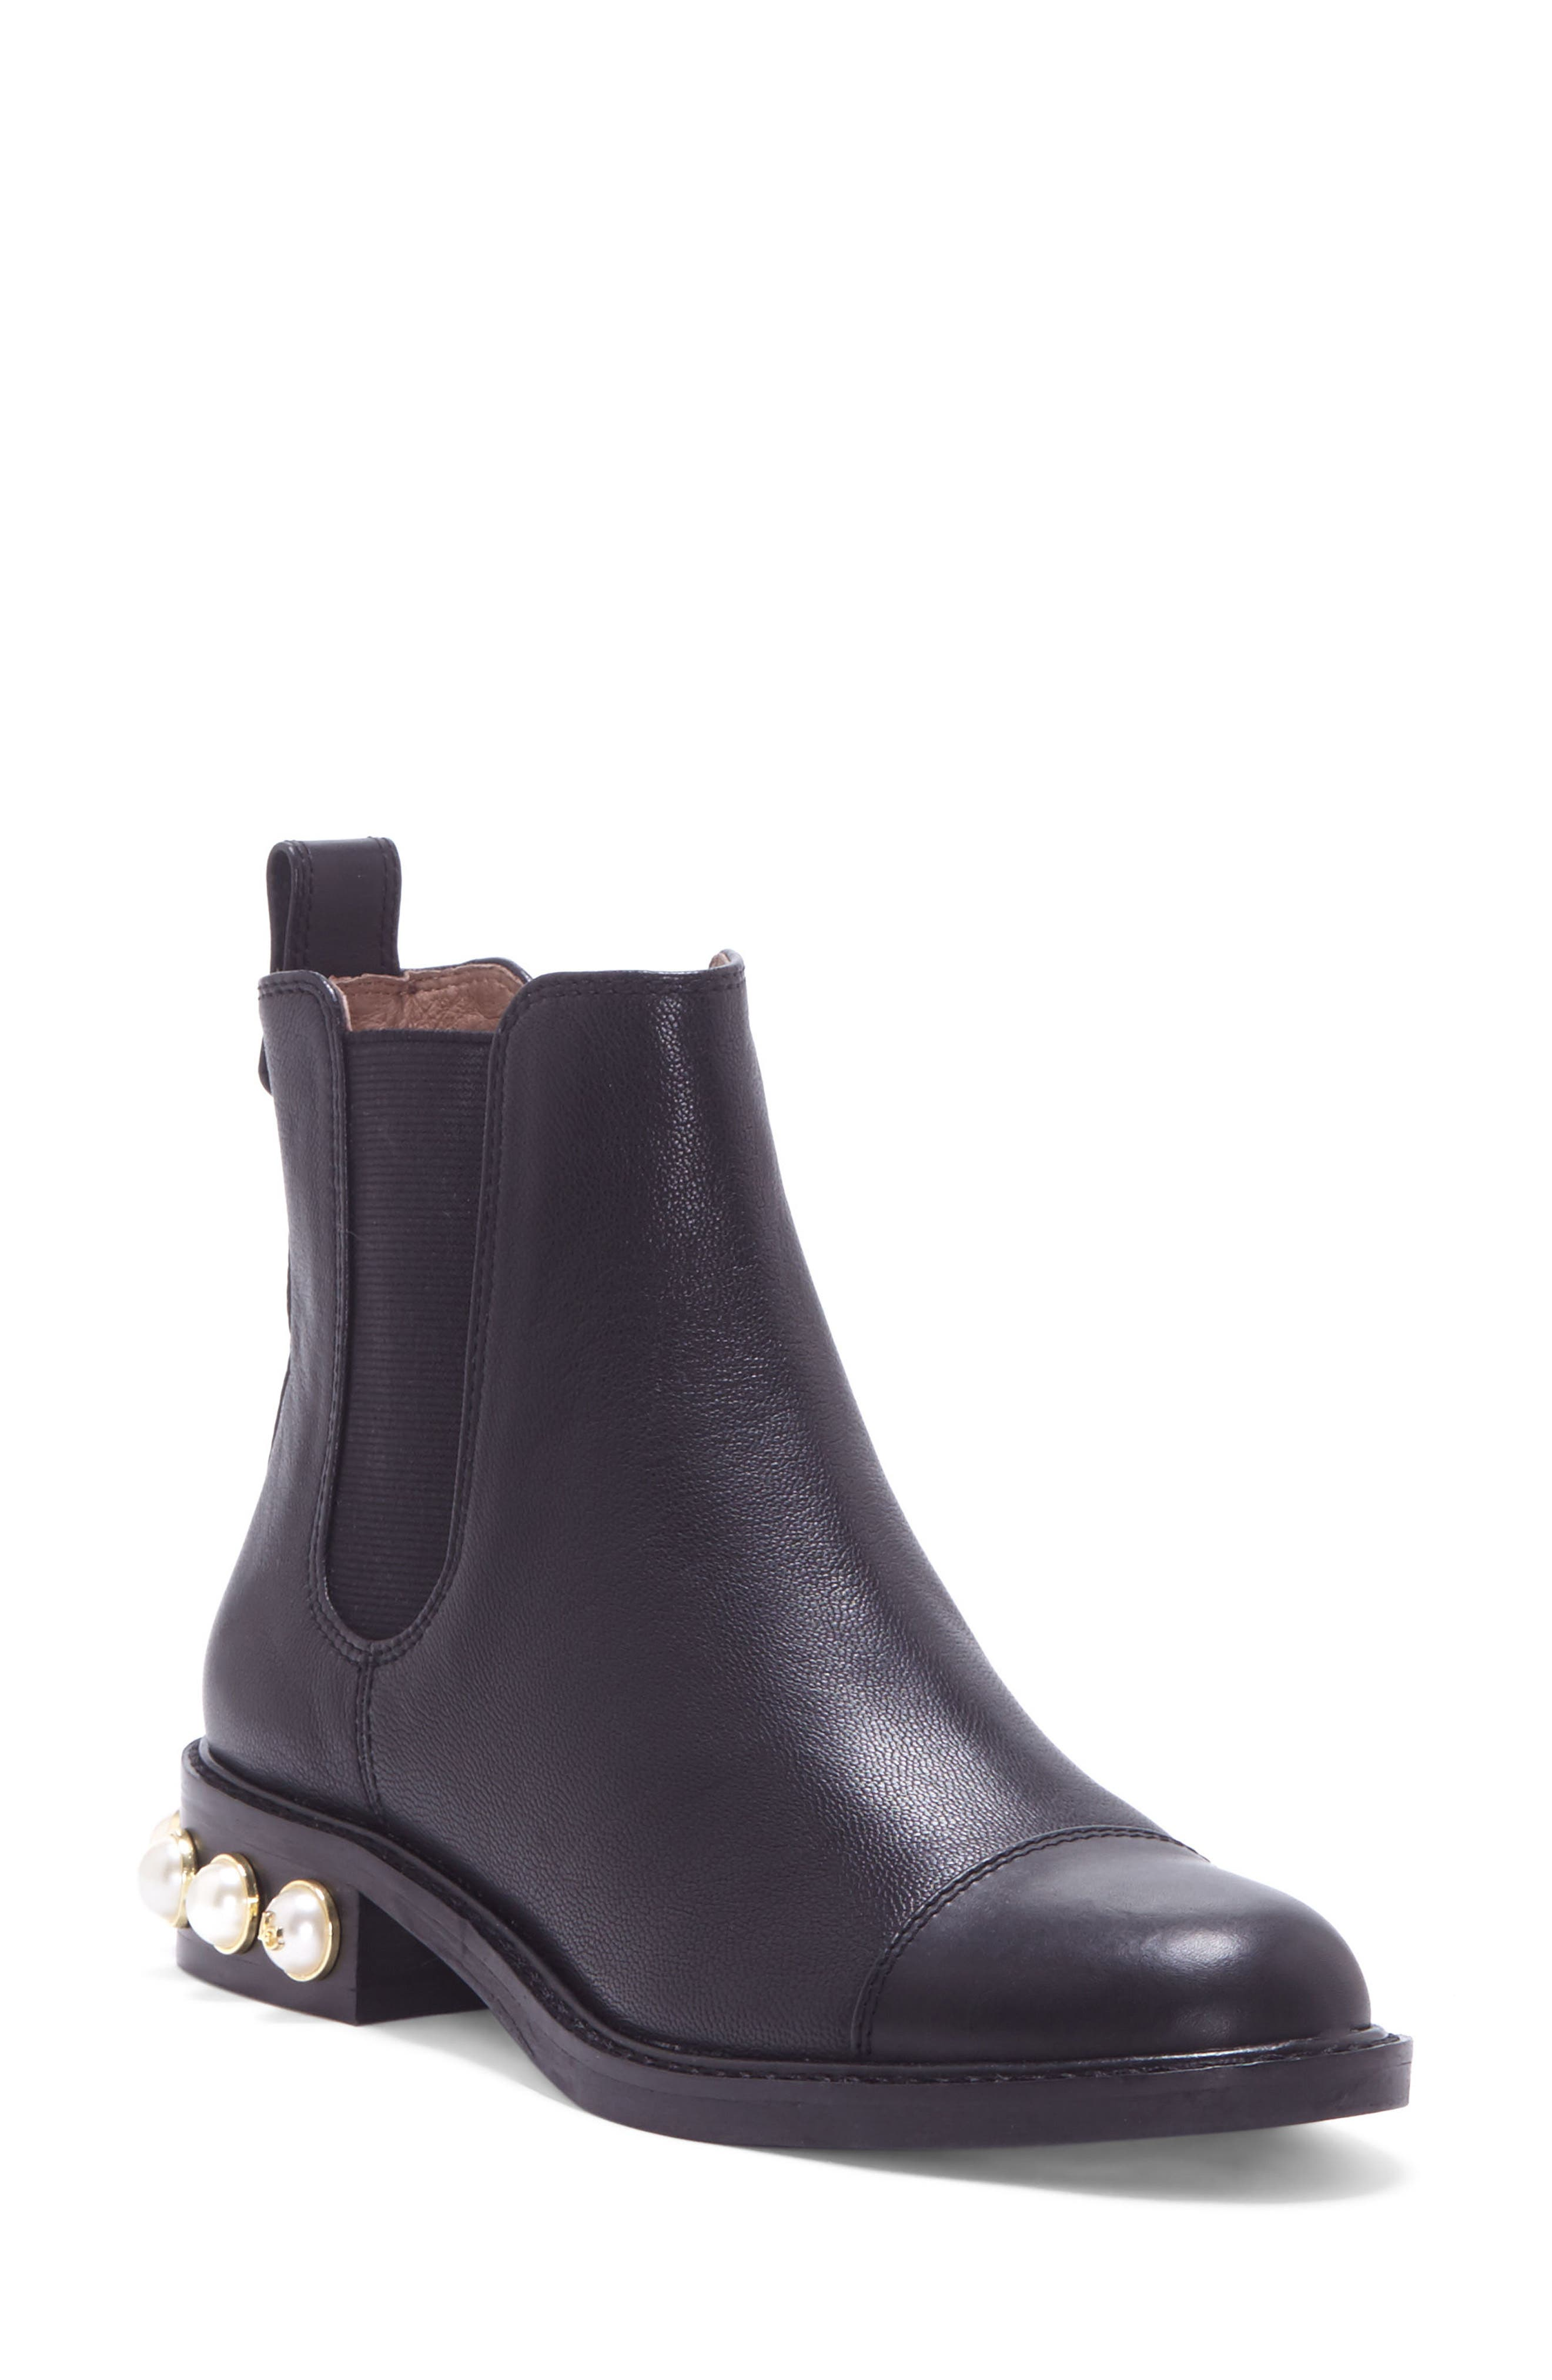 Alternate Image 1 Selected - Louise et Cie Vinn Imitation Pearl Boot (Women)